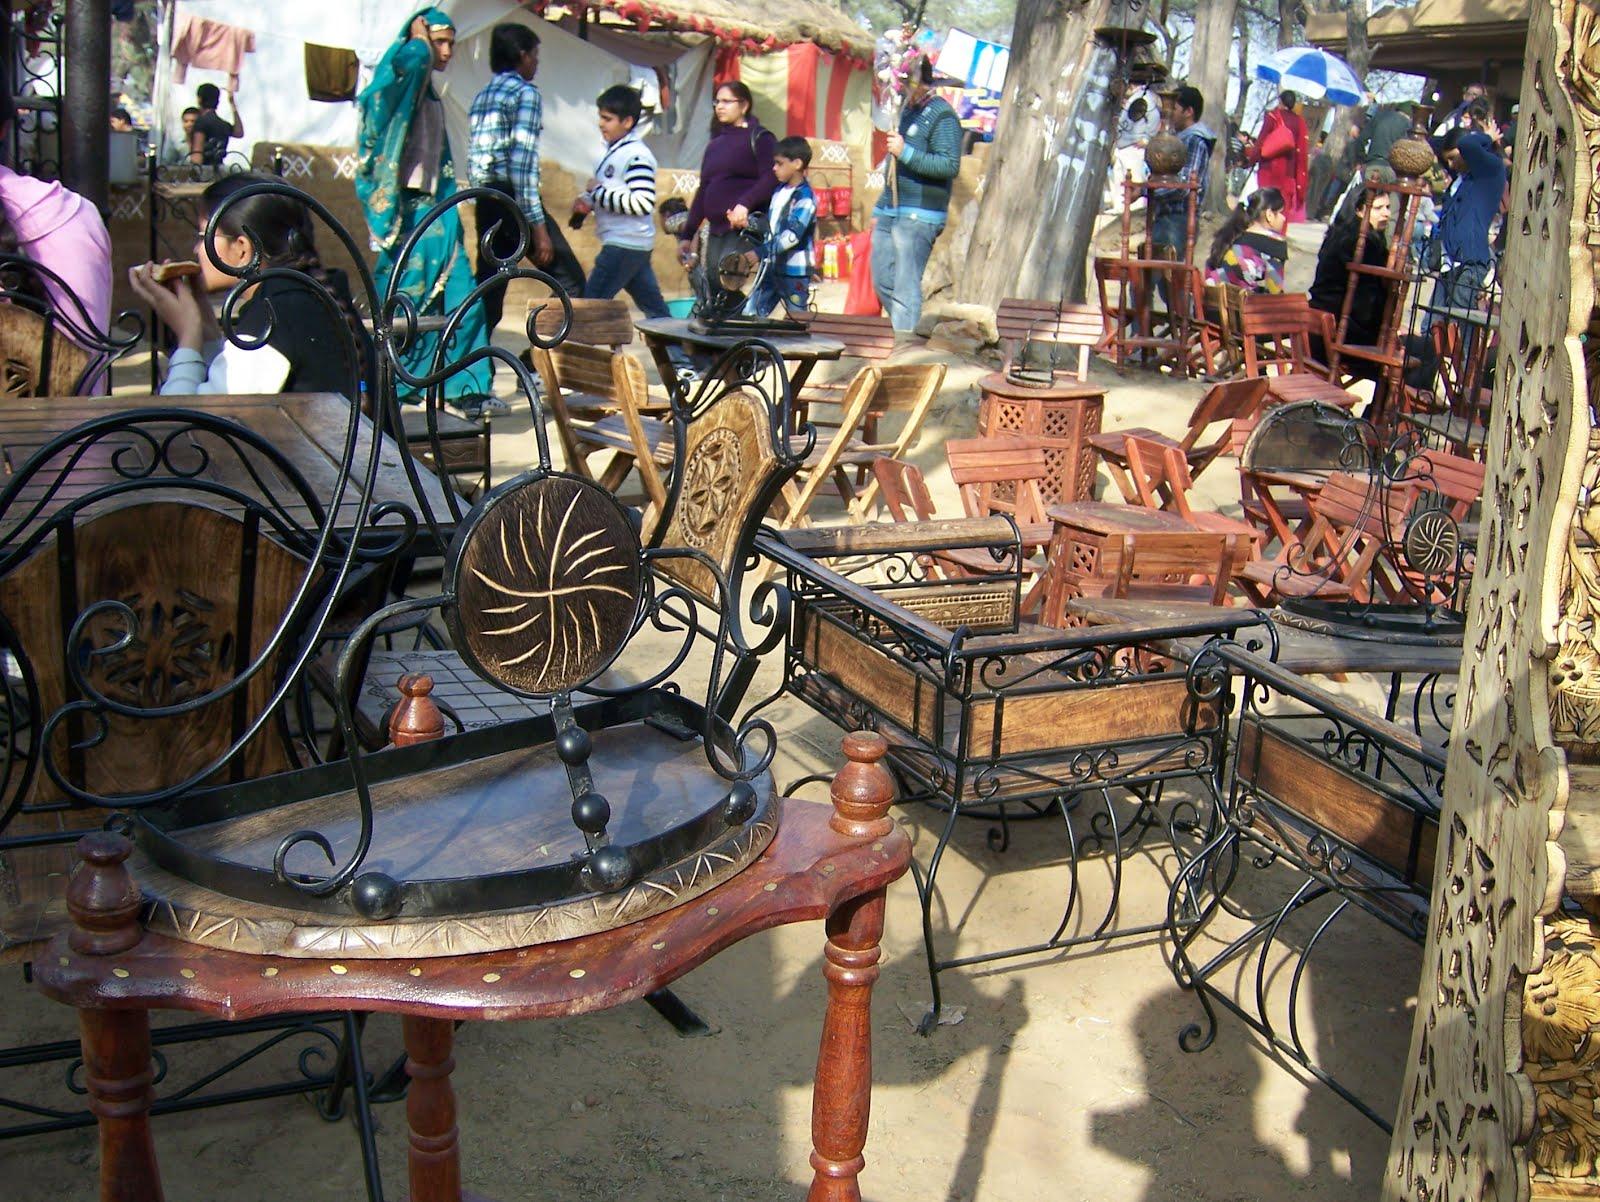 surajkund mela Information about the surajkund craft mela of haryana, india.